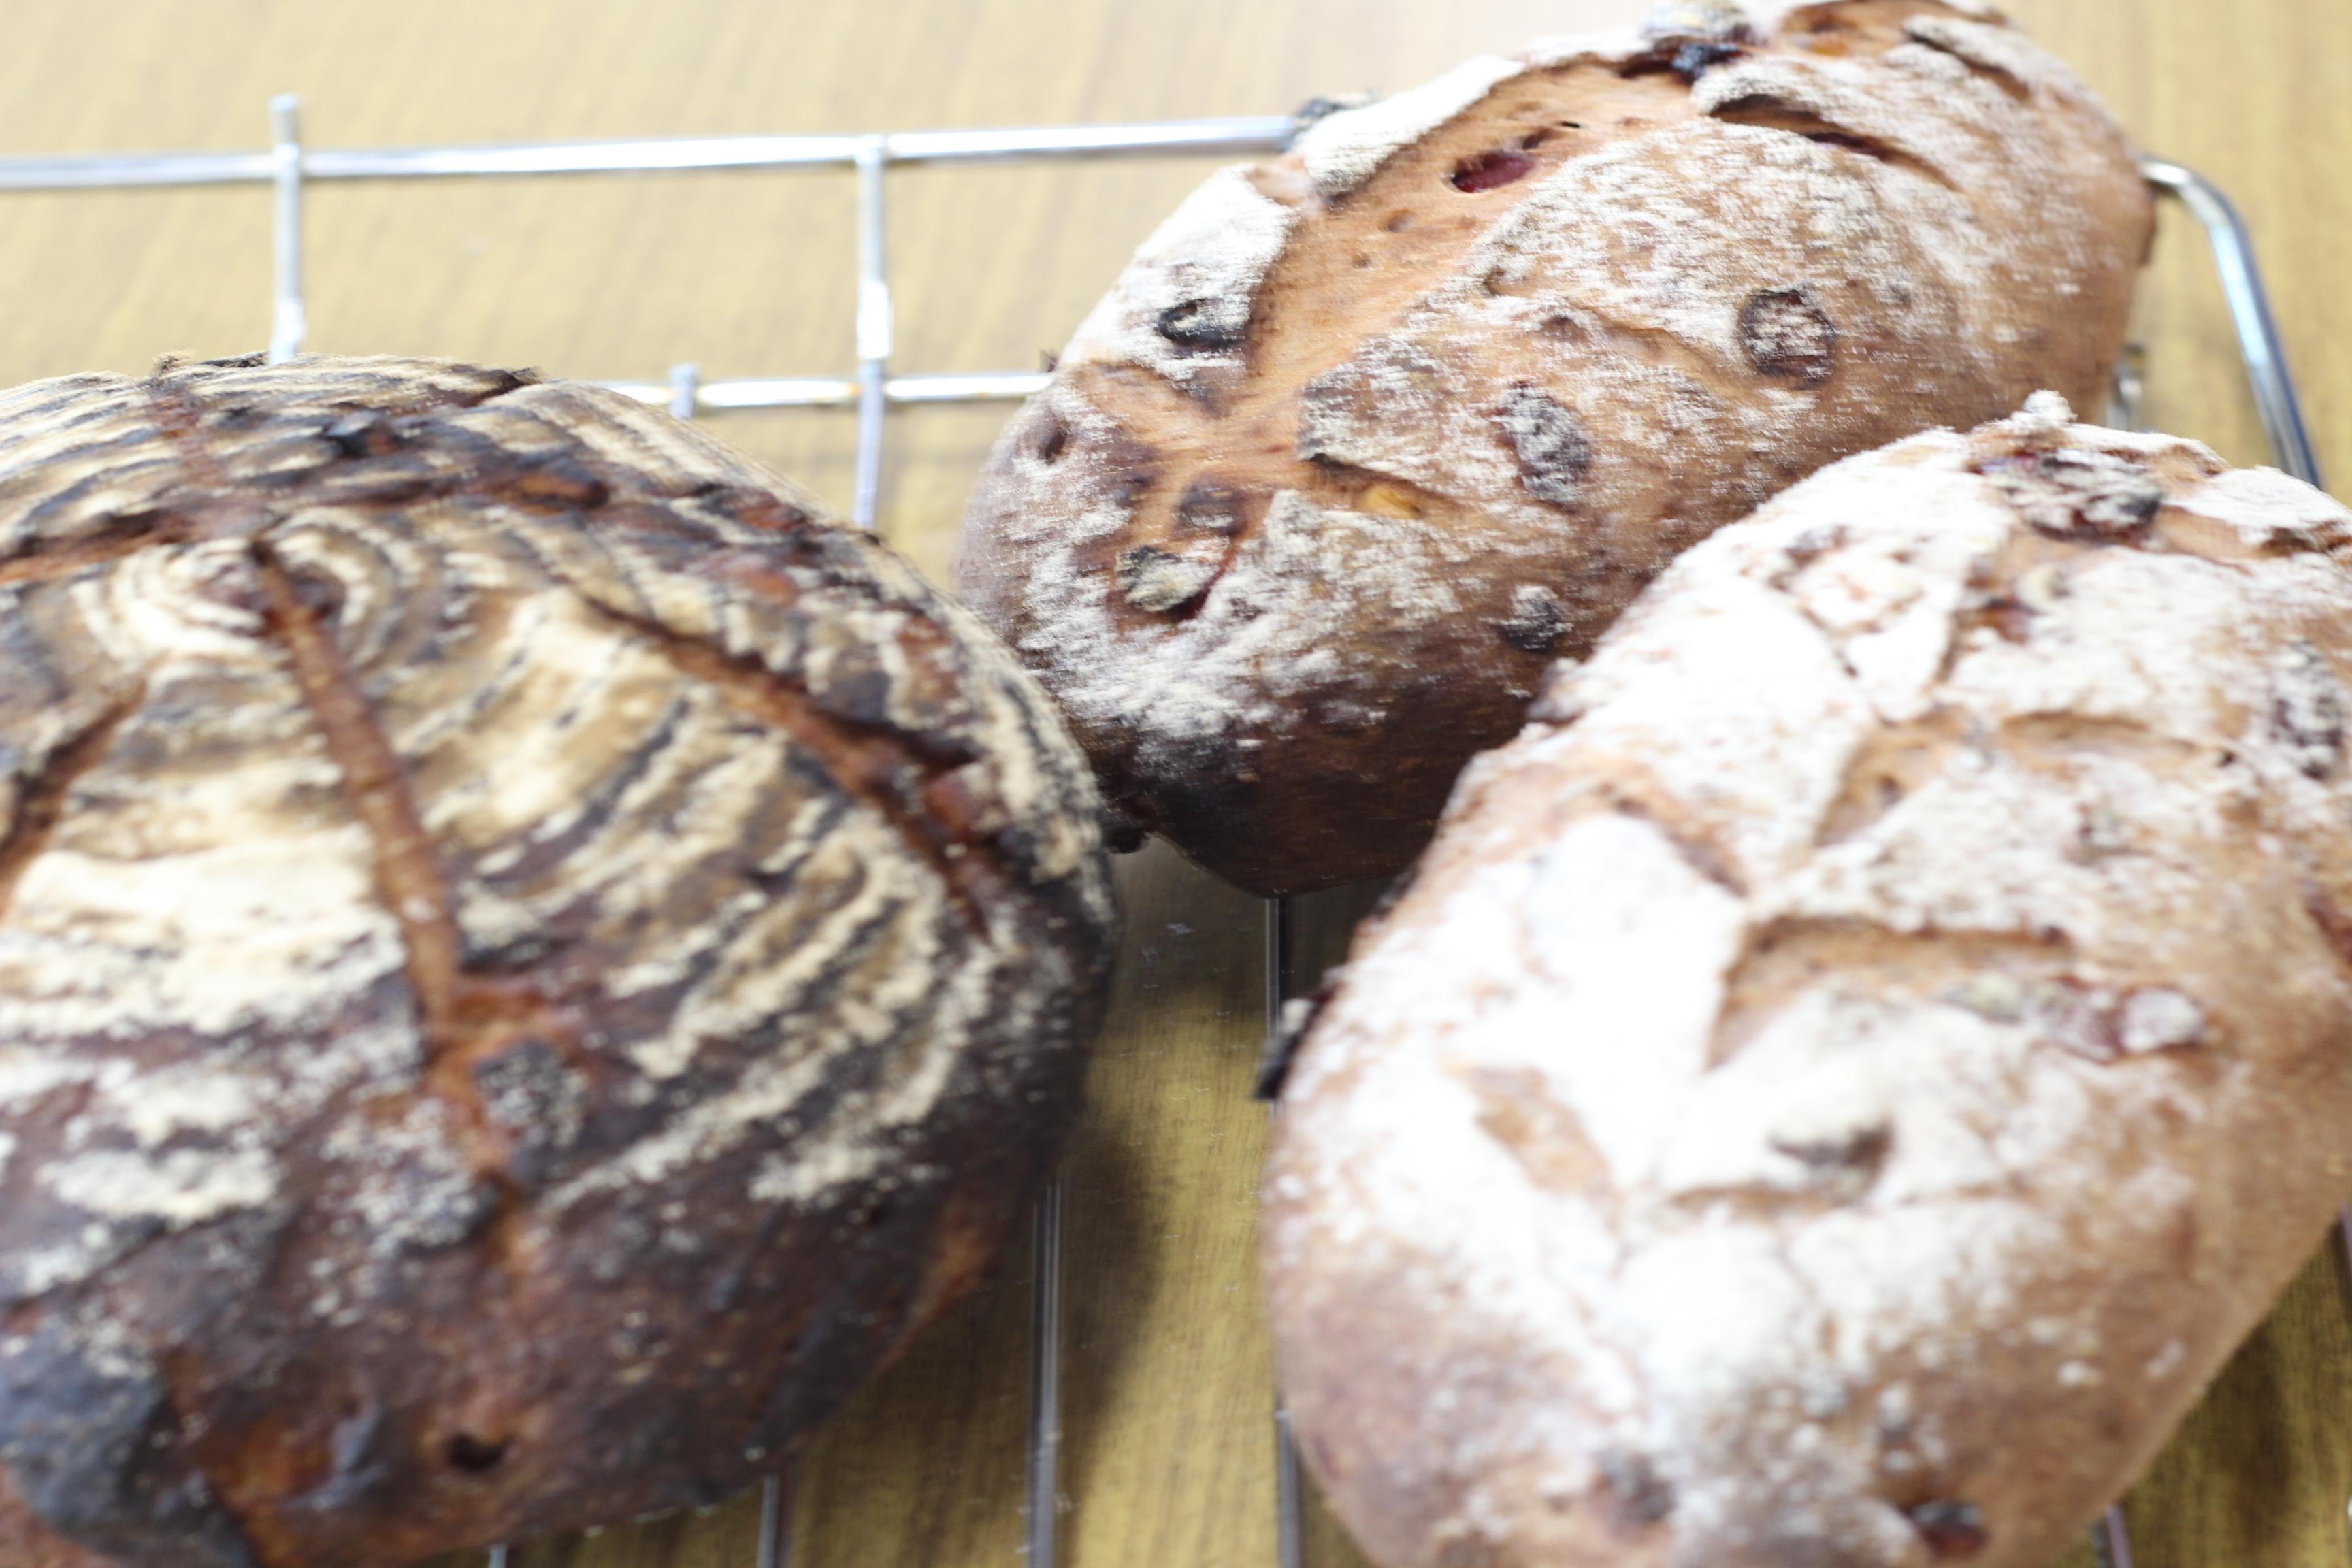 a-ta-sante糖質制限パン料理教室、阿倍野区西田辺。会館でのレッスン『ヌーヴォブレッド』最終回